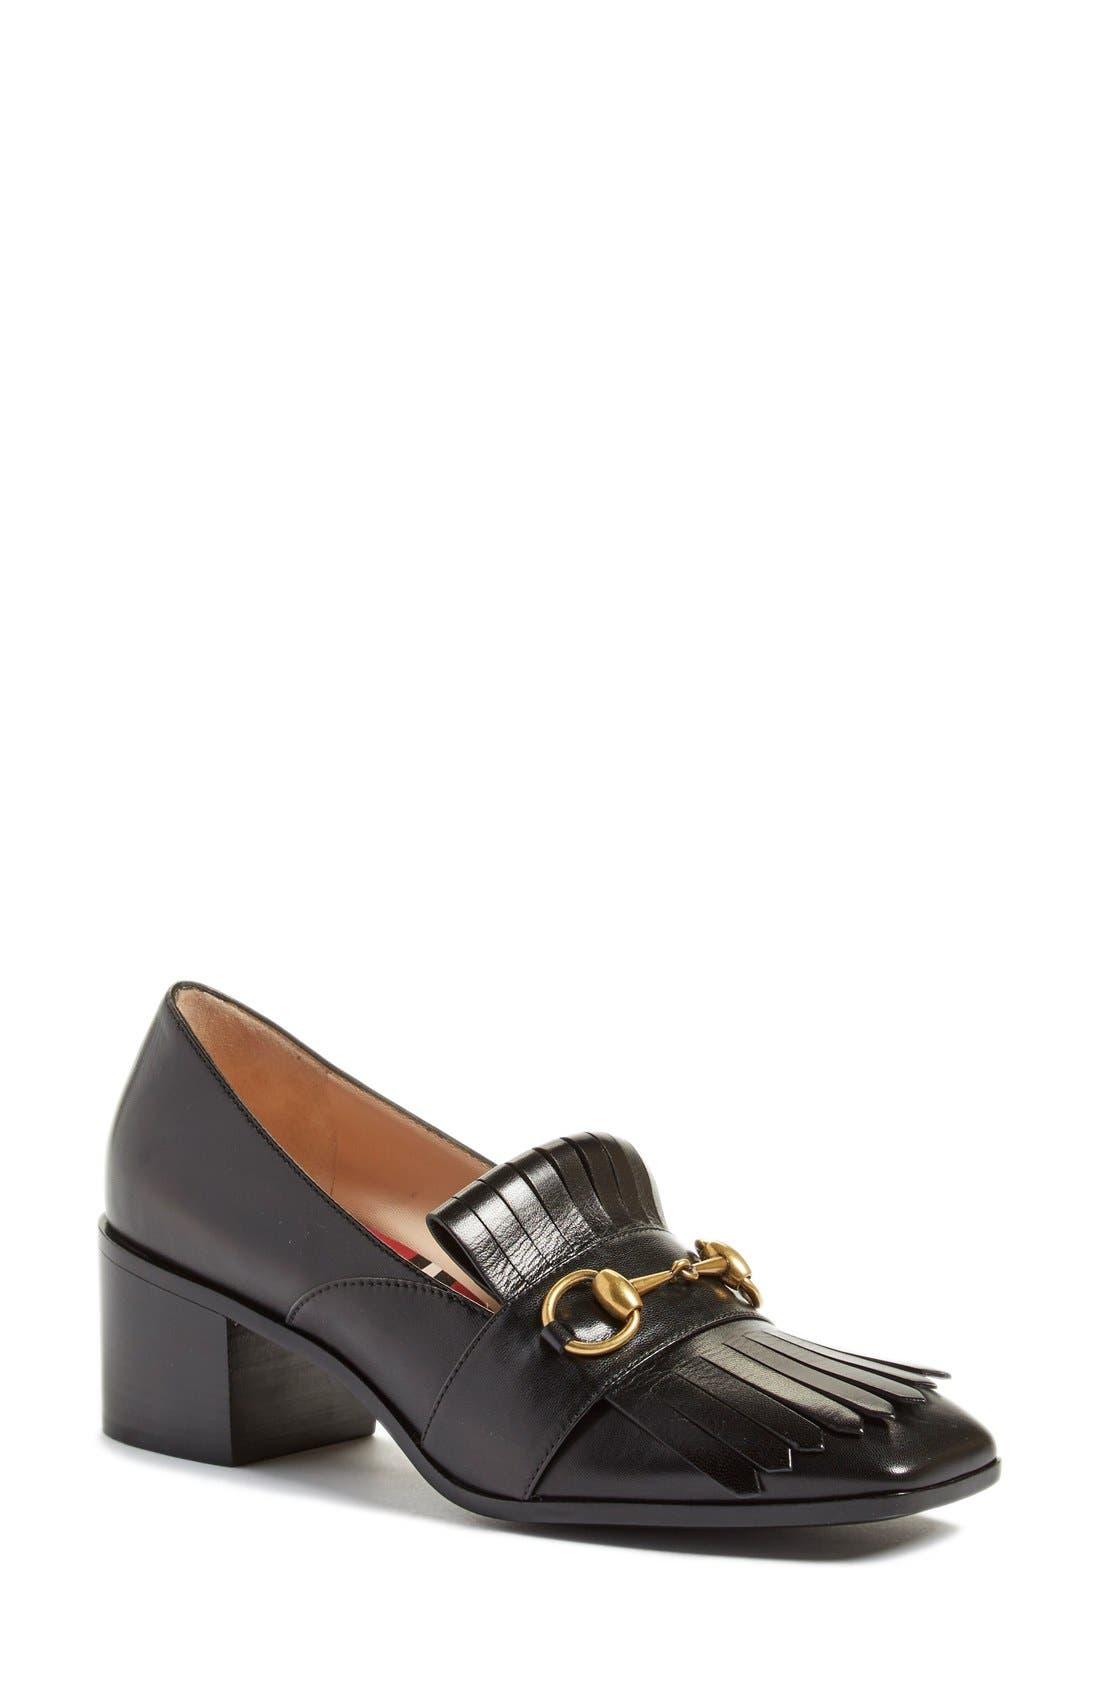 Main Image - Gucci 'Polly' Block Heel Pump (Women)